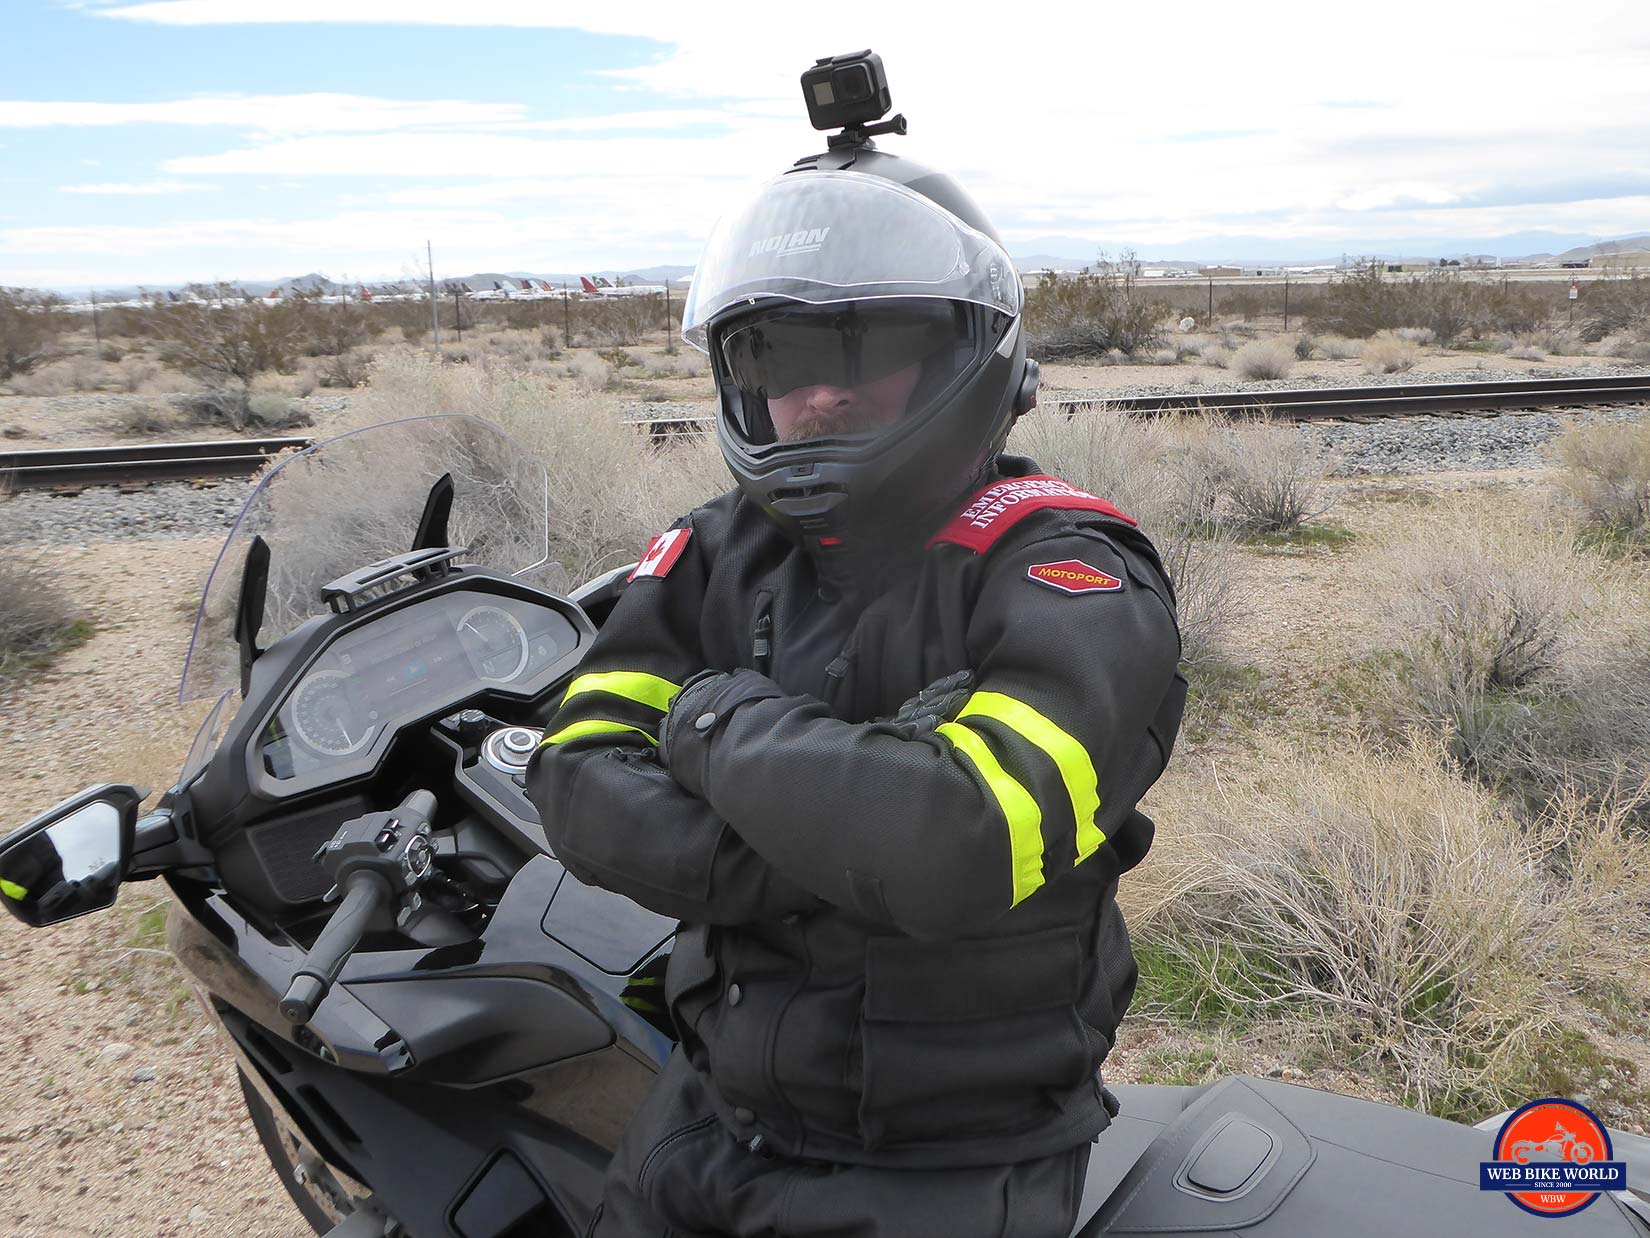 Me wearing my Motoport USA mesh jacket and Nolan N100-5 helmet.